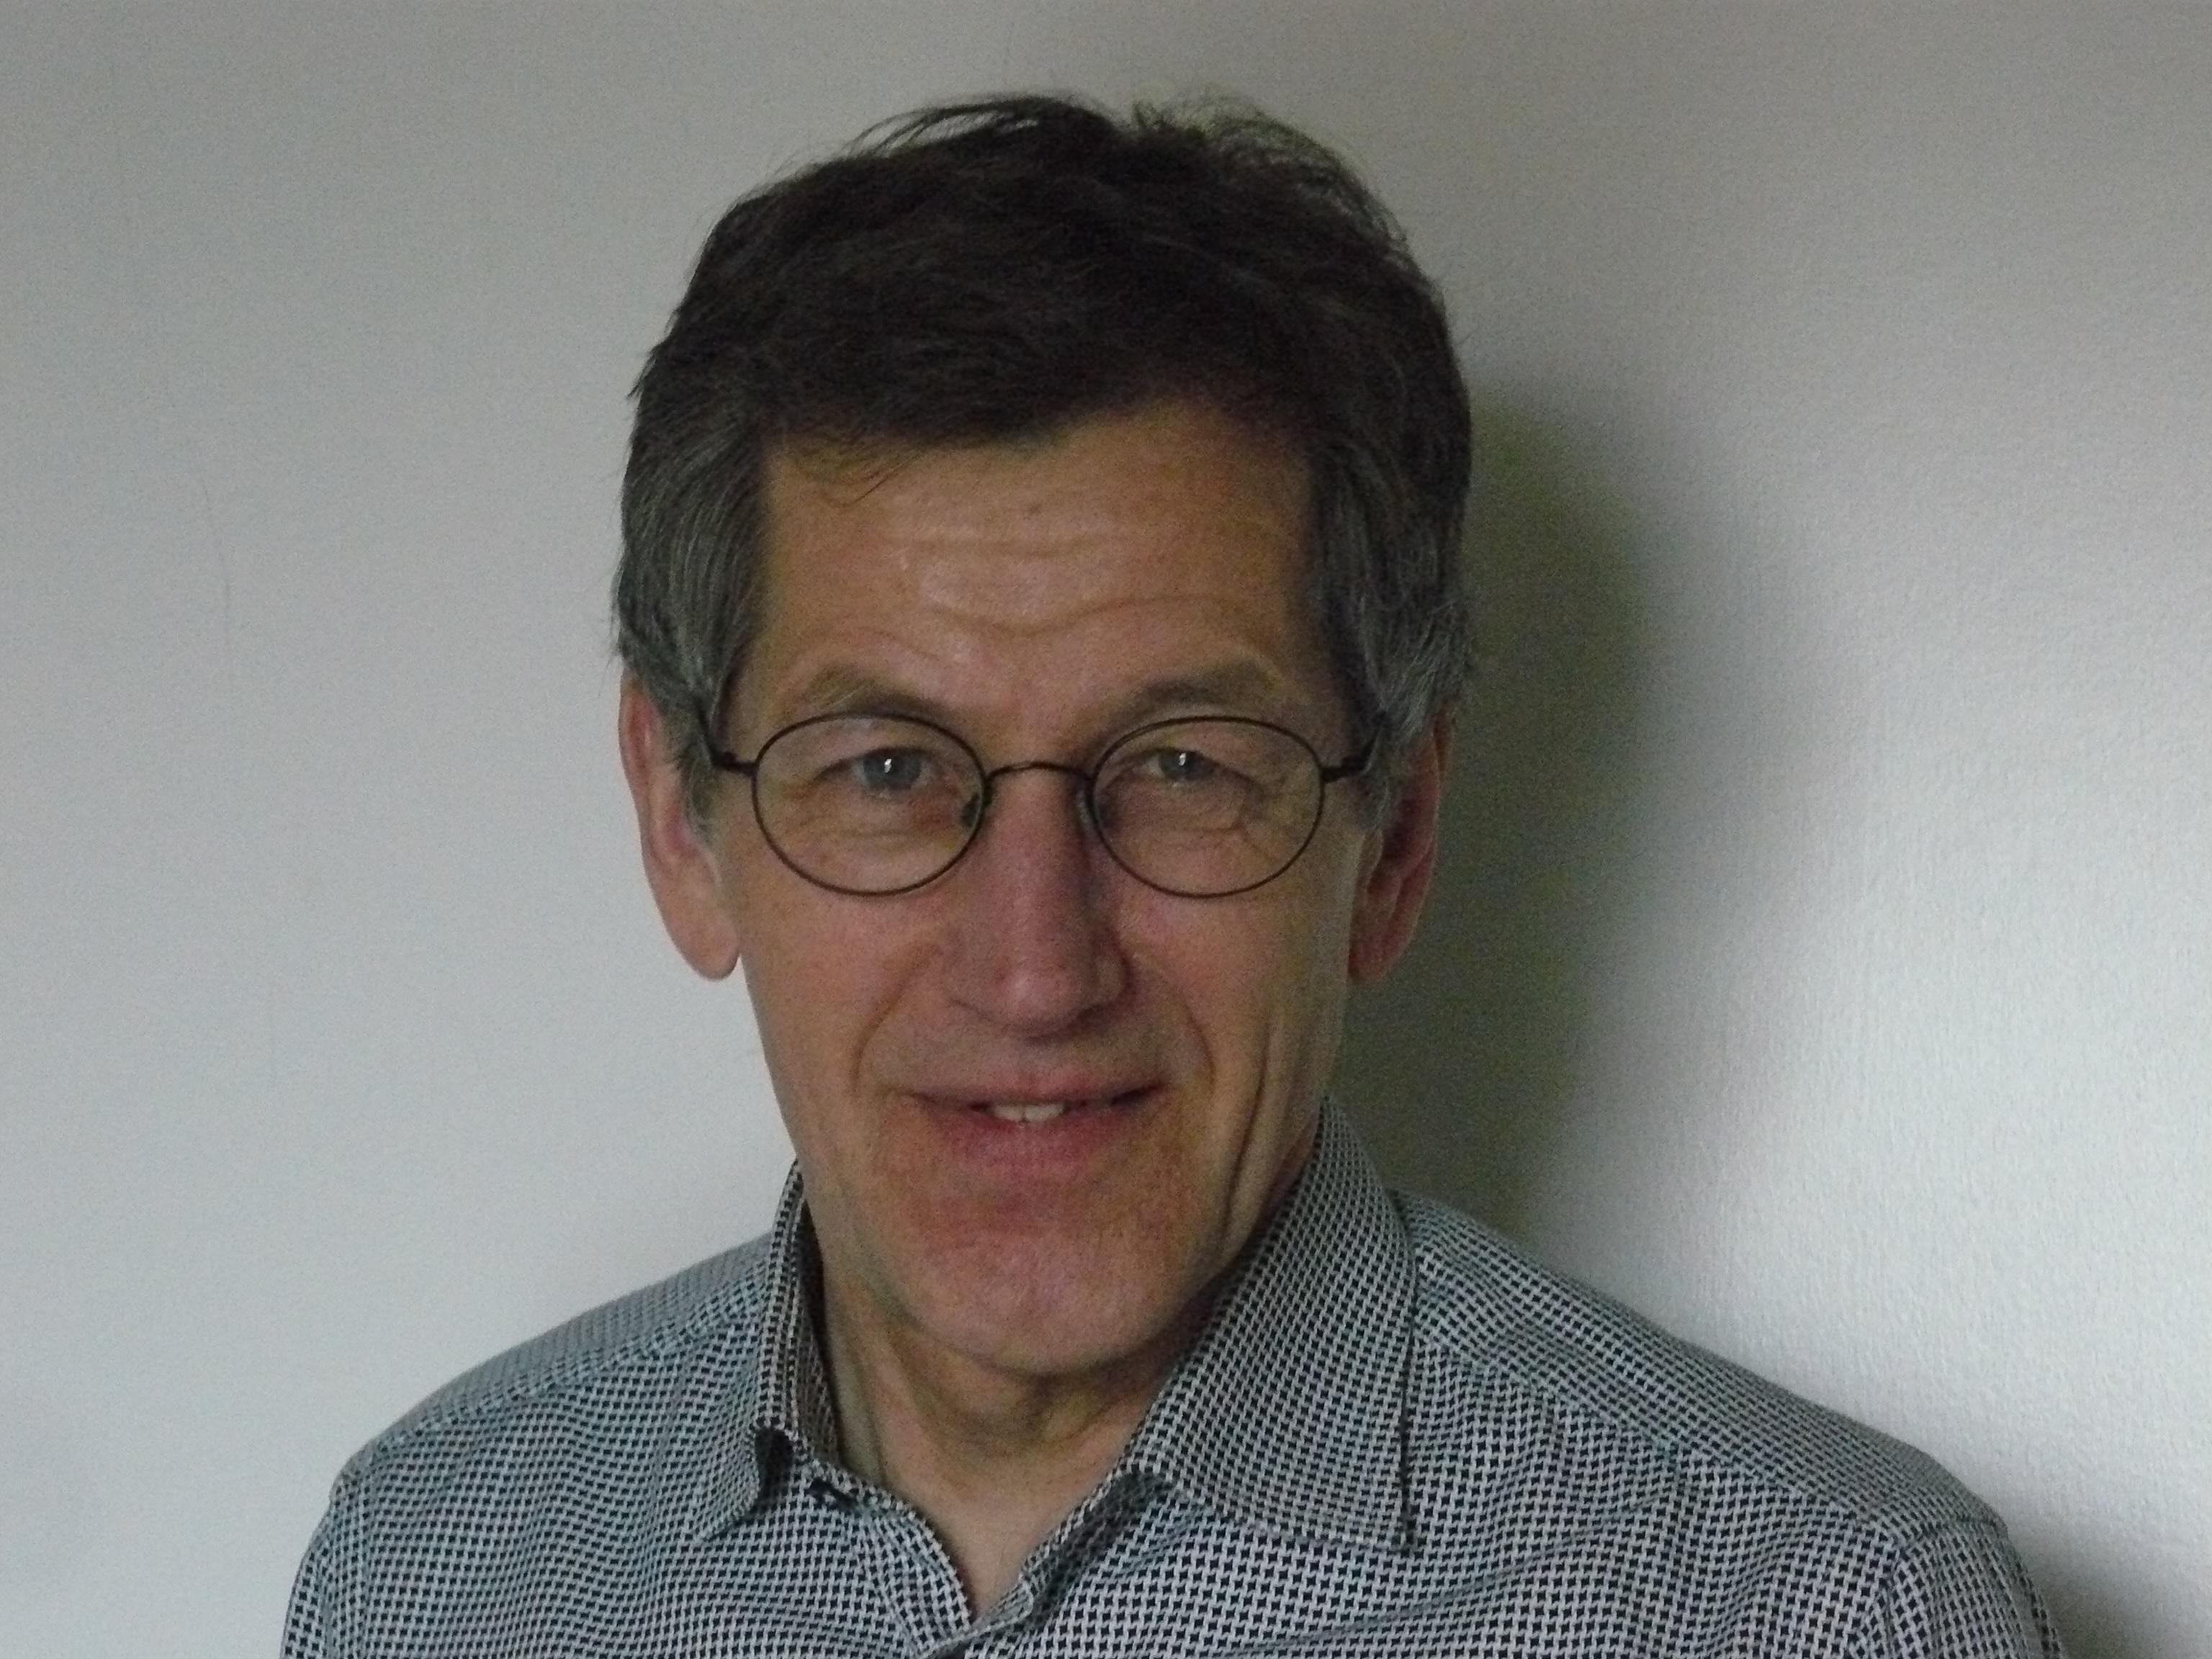 Mads Peter Sørensen